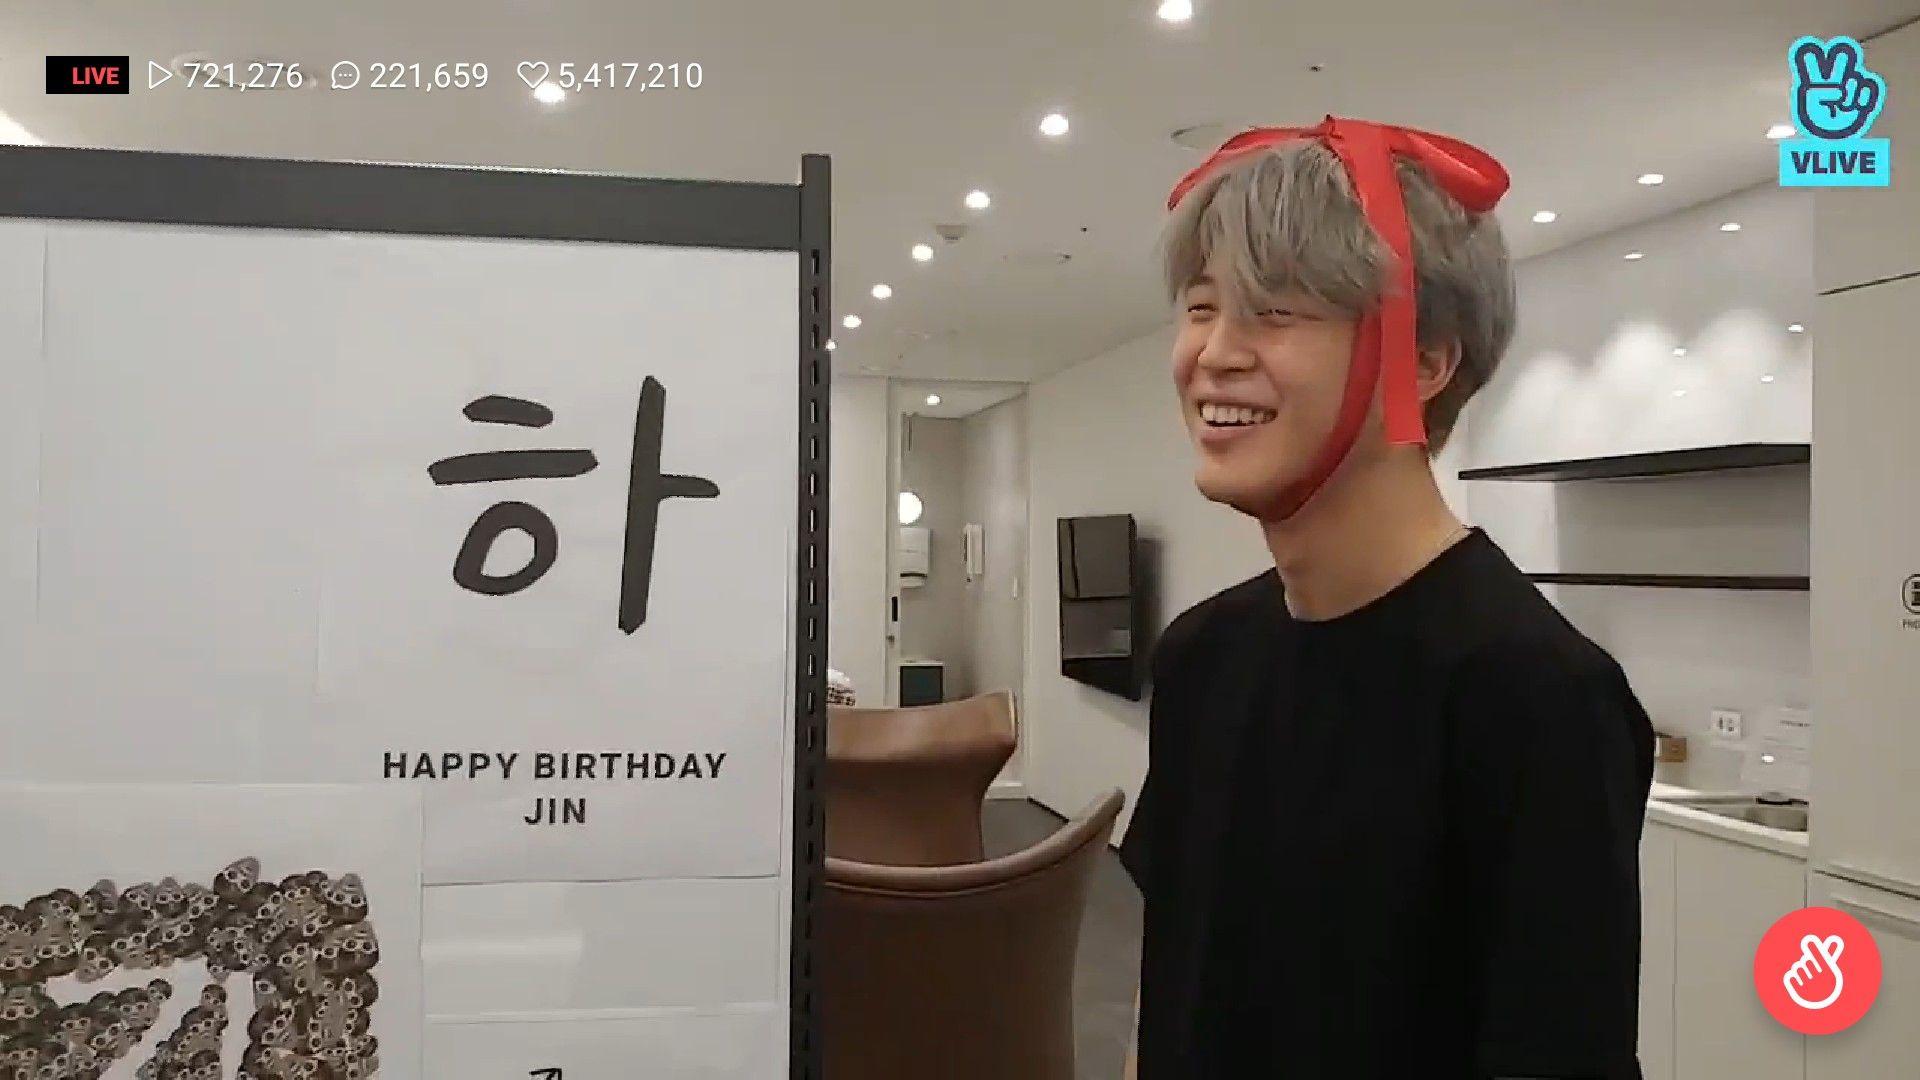 Gift Boy Jimin Birthday Jin From Vlive Jimin Birthday Happy